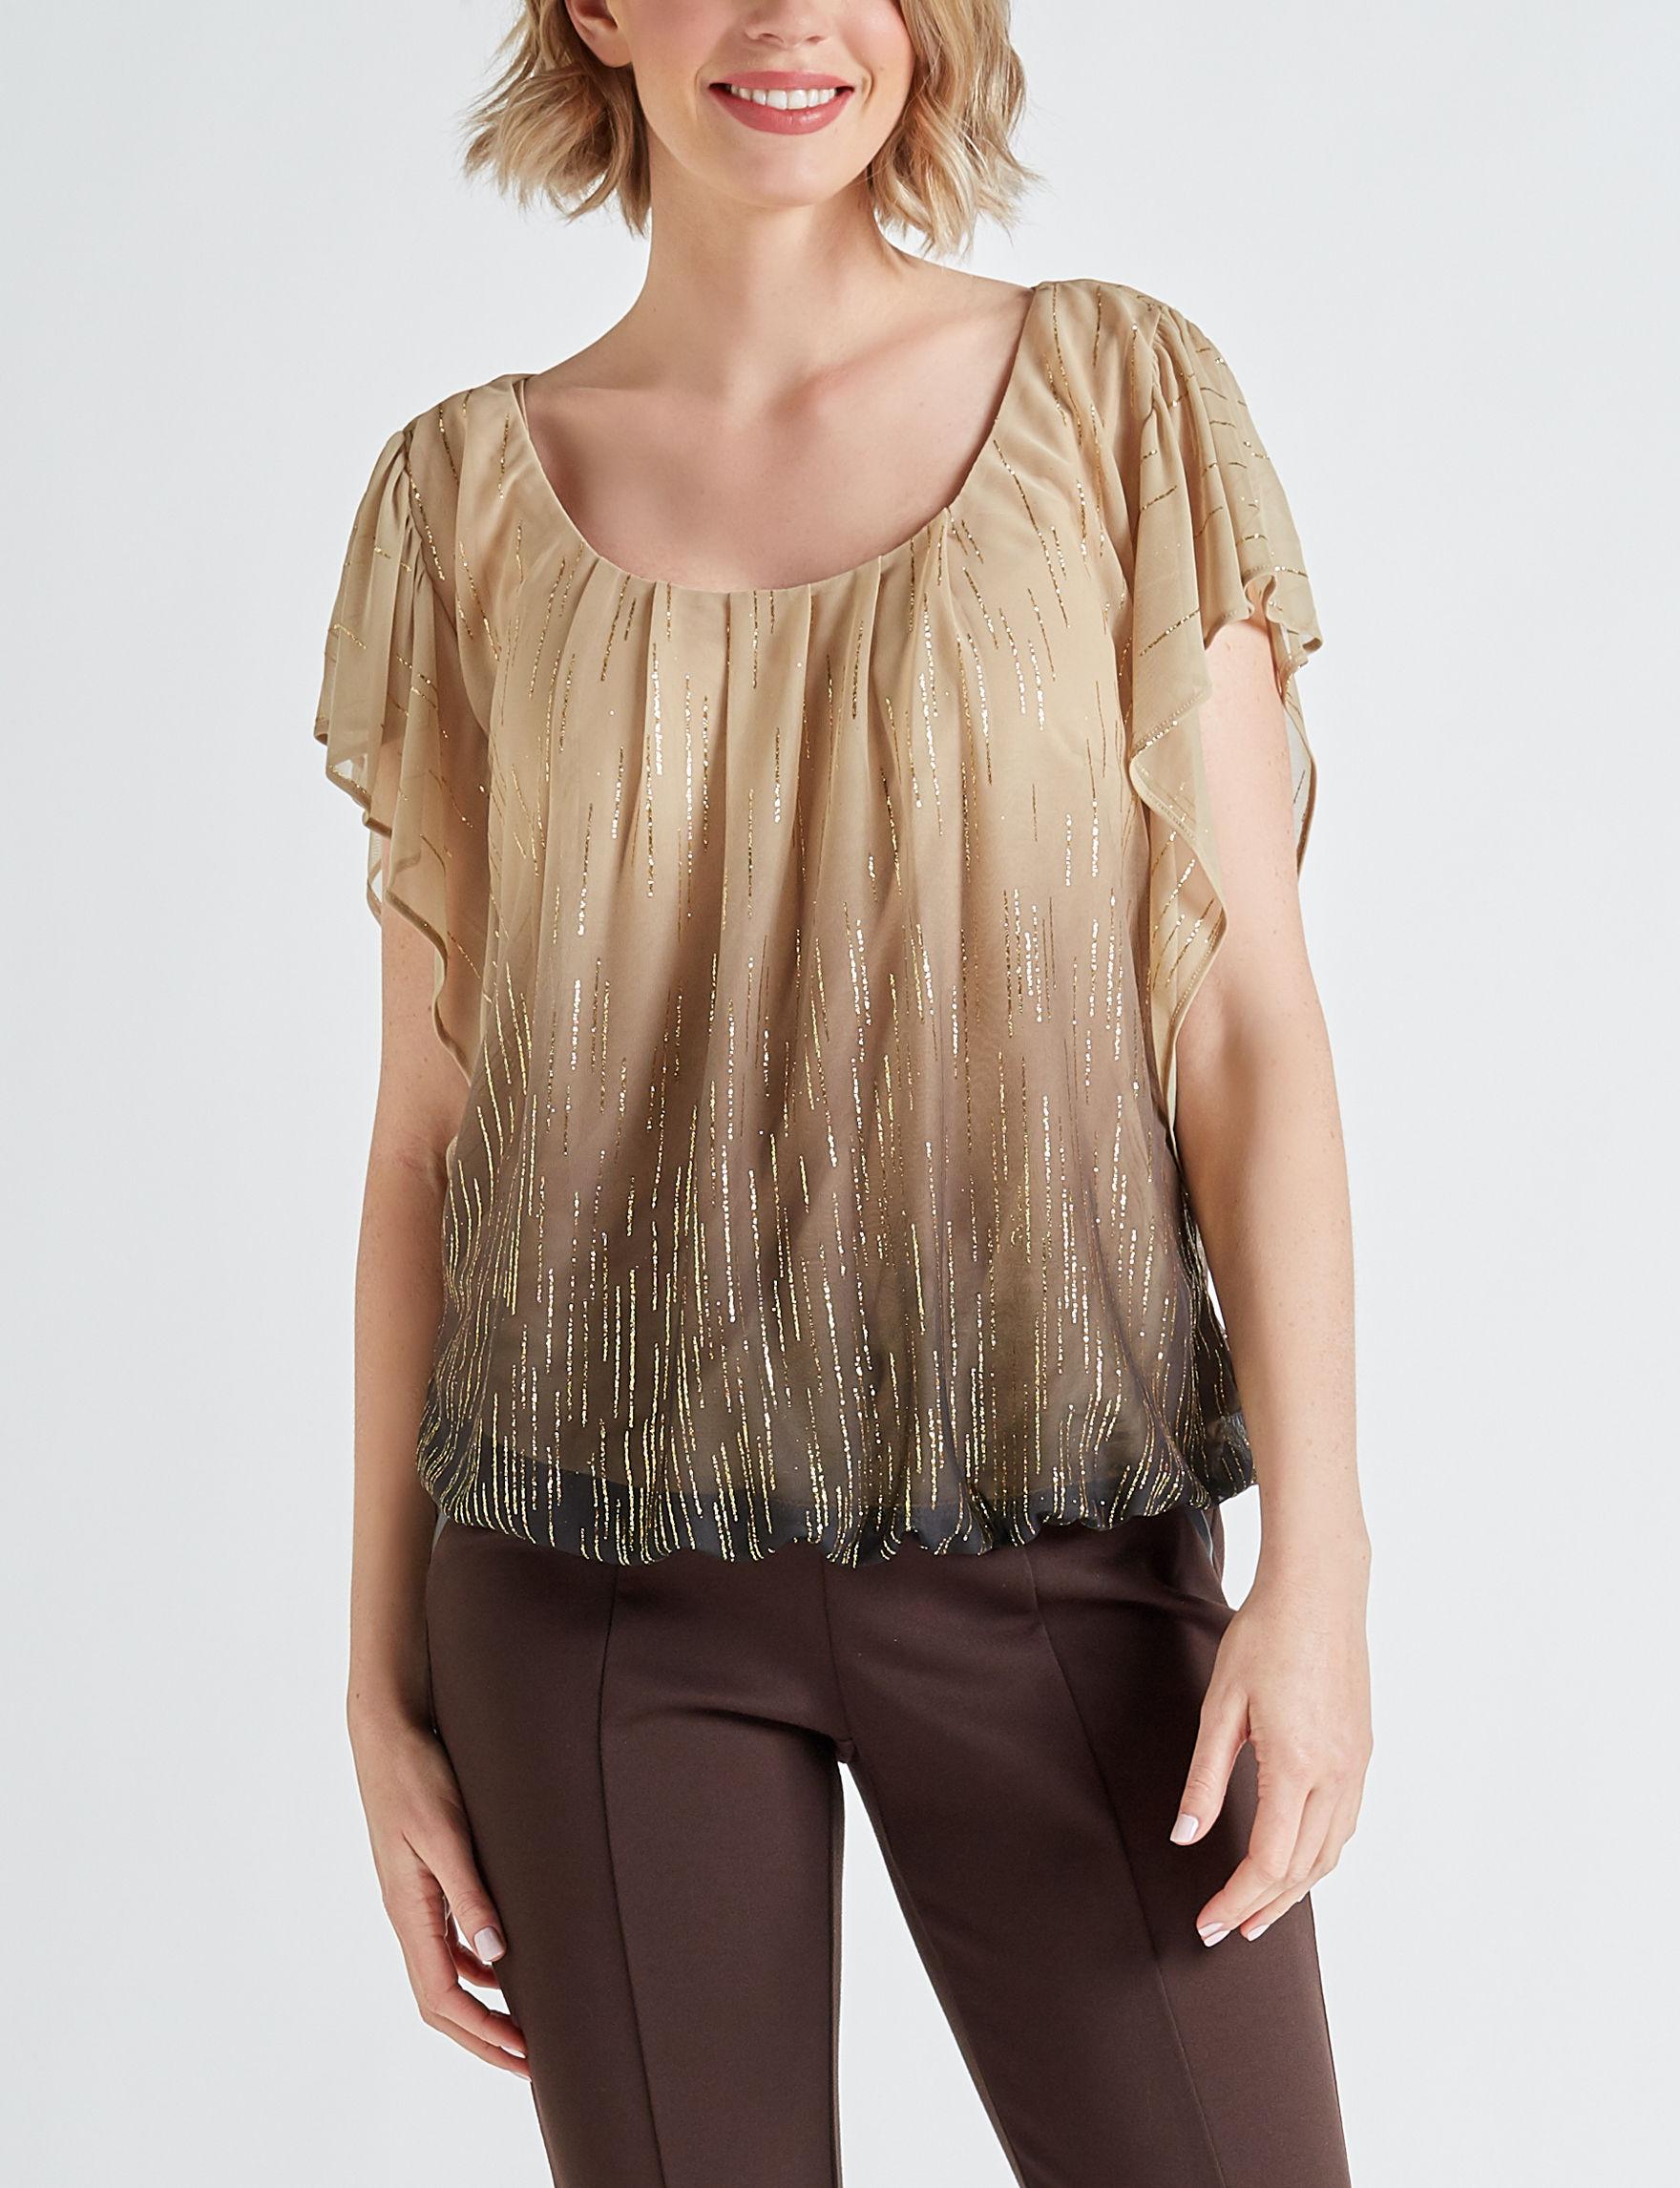 Sara Michelle Gold Shirts & Blouses